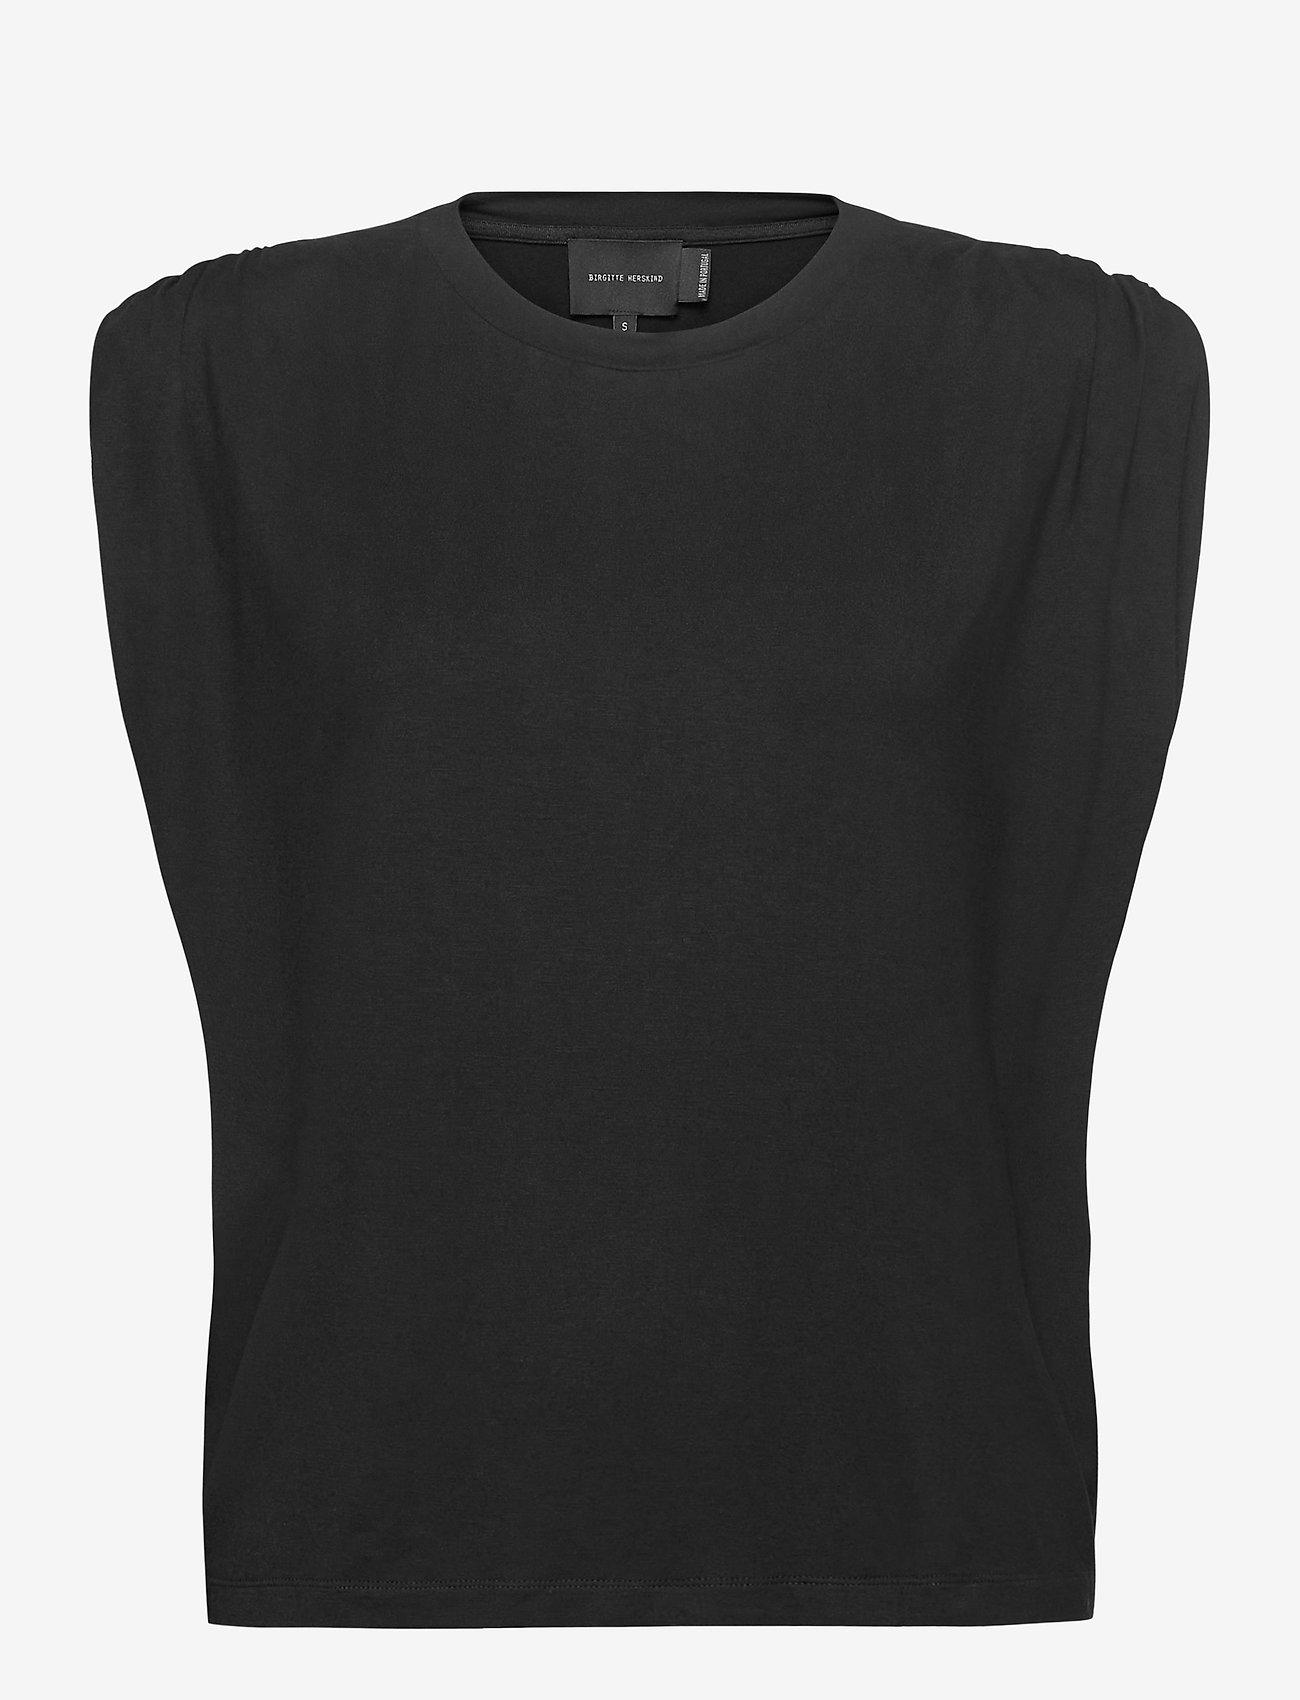 Birgitte Herskind - Sky T-shirt - Ærmeløse toppe - black - 0